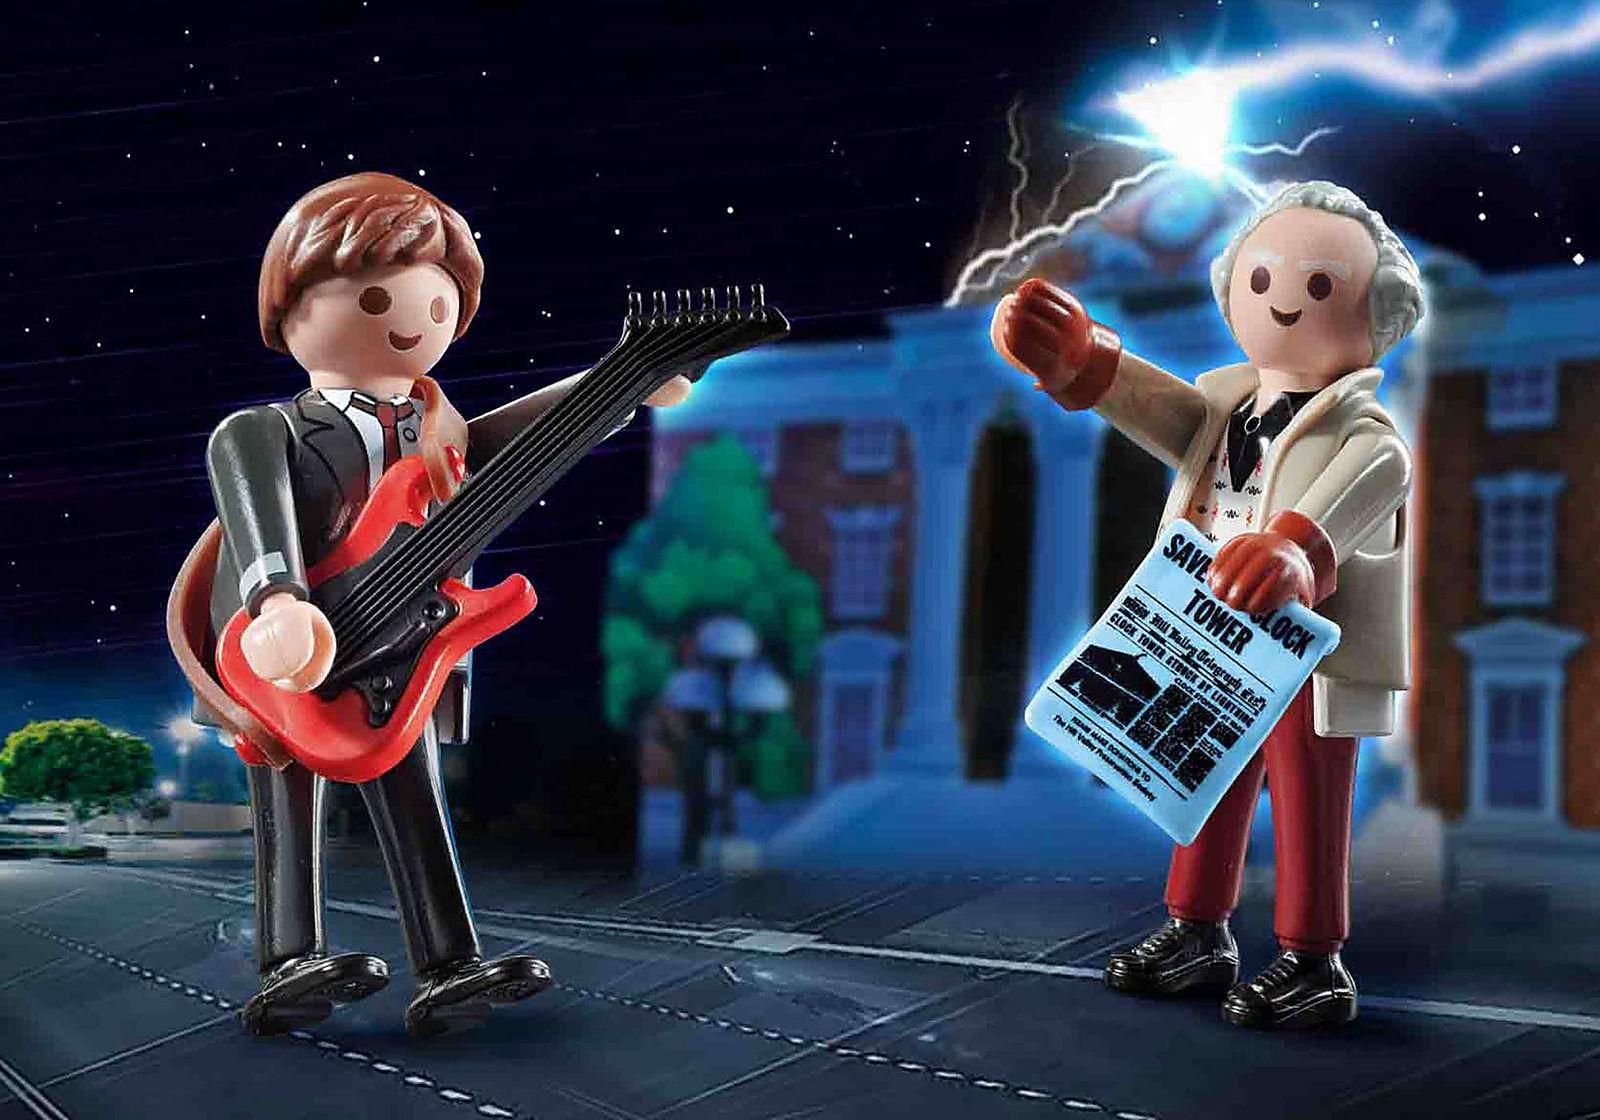 PLAYMOBIL 70459 Regreso al futuro Marty McFly y Dr. Emmett Brown  Back to the Future